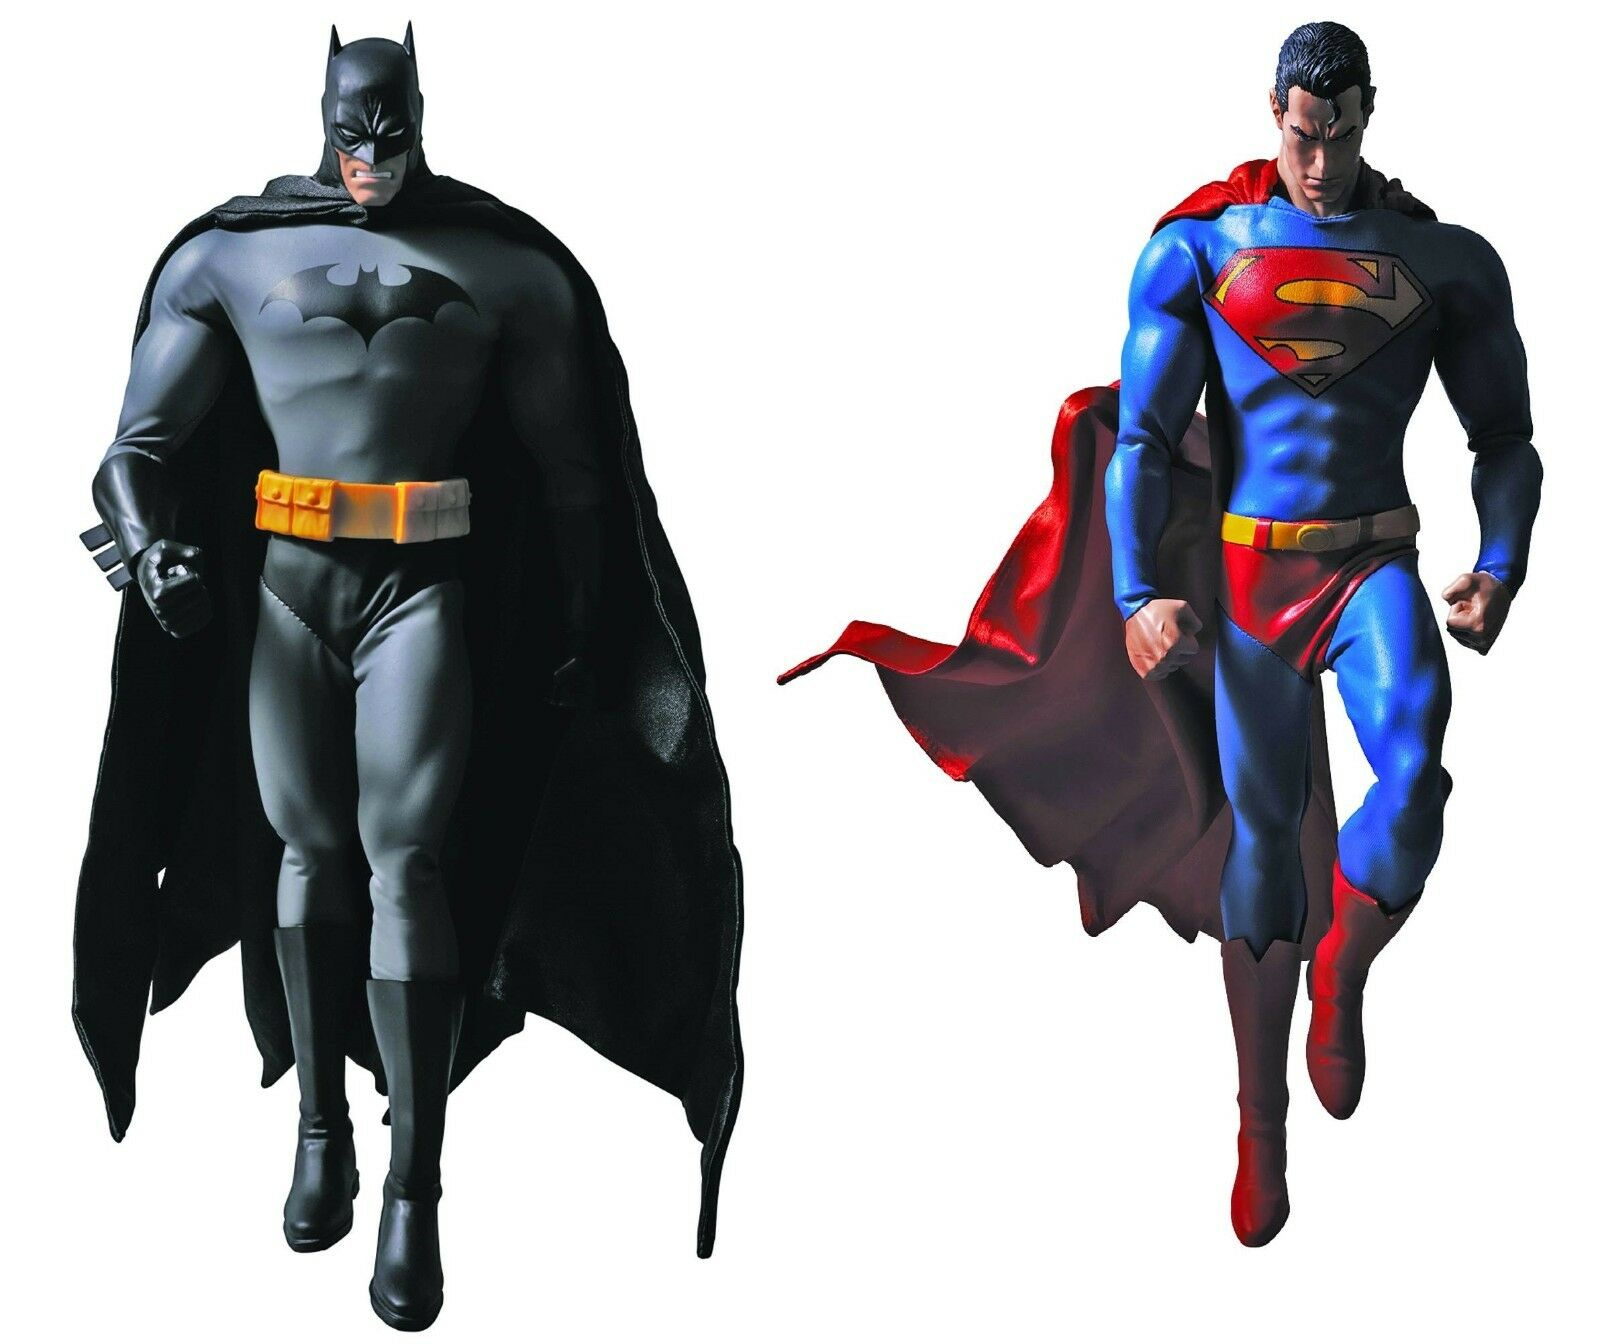 MEDICOM Real Action Heroes RAH Hush BATMAN & SUPERMAN 1/6 SCALE FIGURE SET